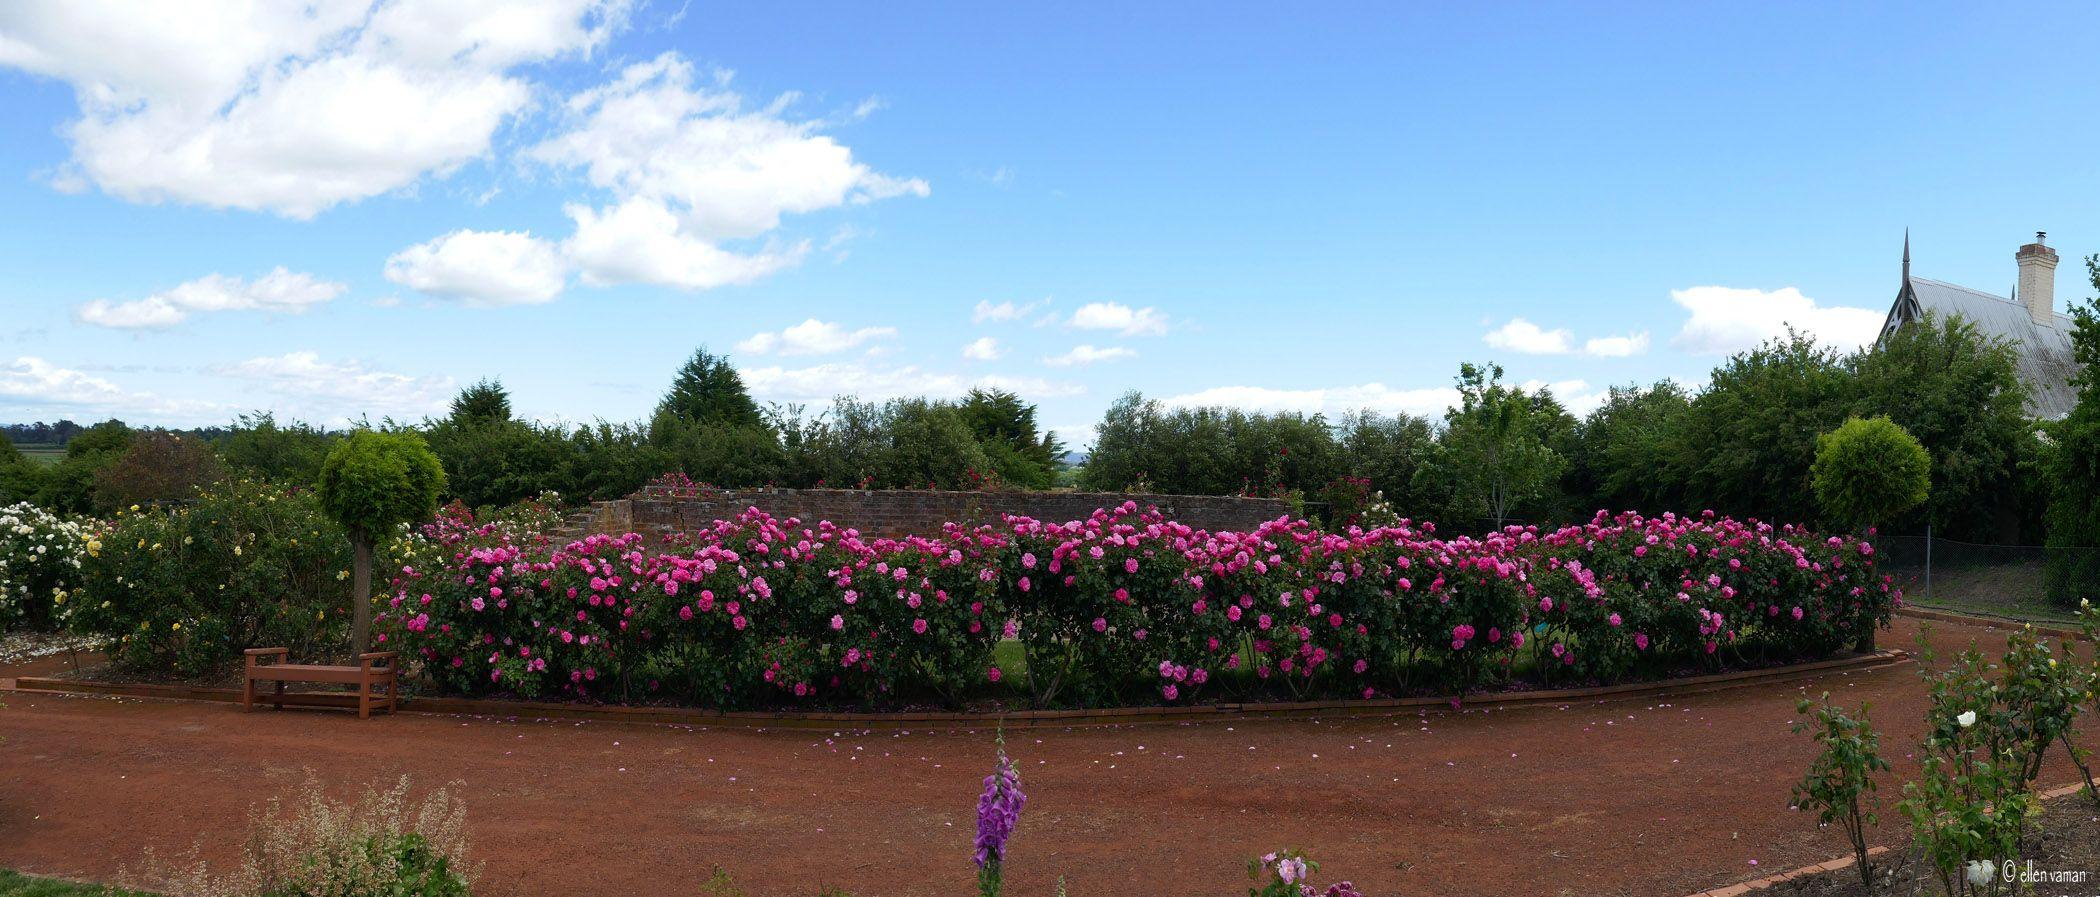 ✣ Rose Garden, Woolmers,Tasmania ✣  Photograph © Ellen Vaman www.facebook.com/ellen.vaman1 #EllenVaman #Photography #Tasmania #WoolmersRoseGarden #Flowers #Garden #Beauty #Wildlife #Nature